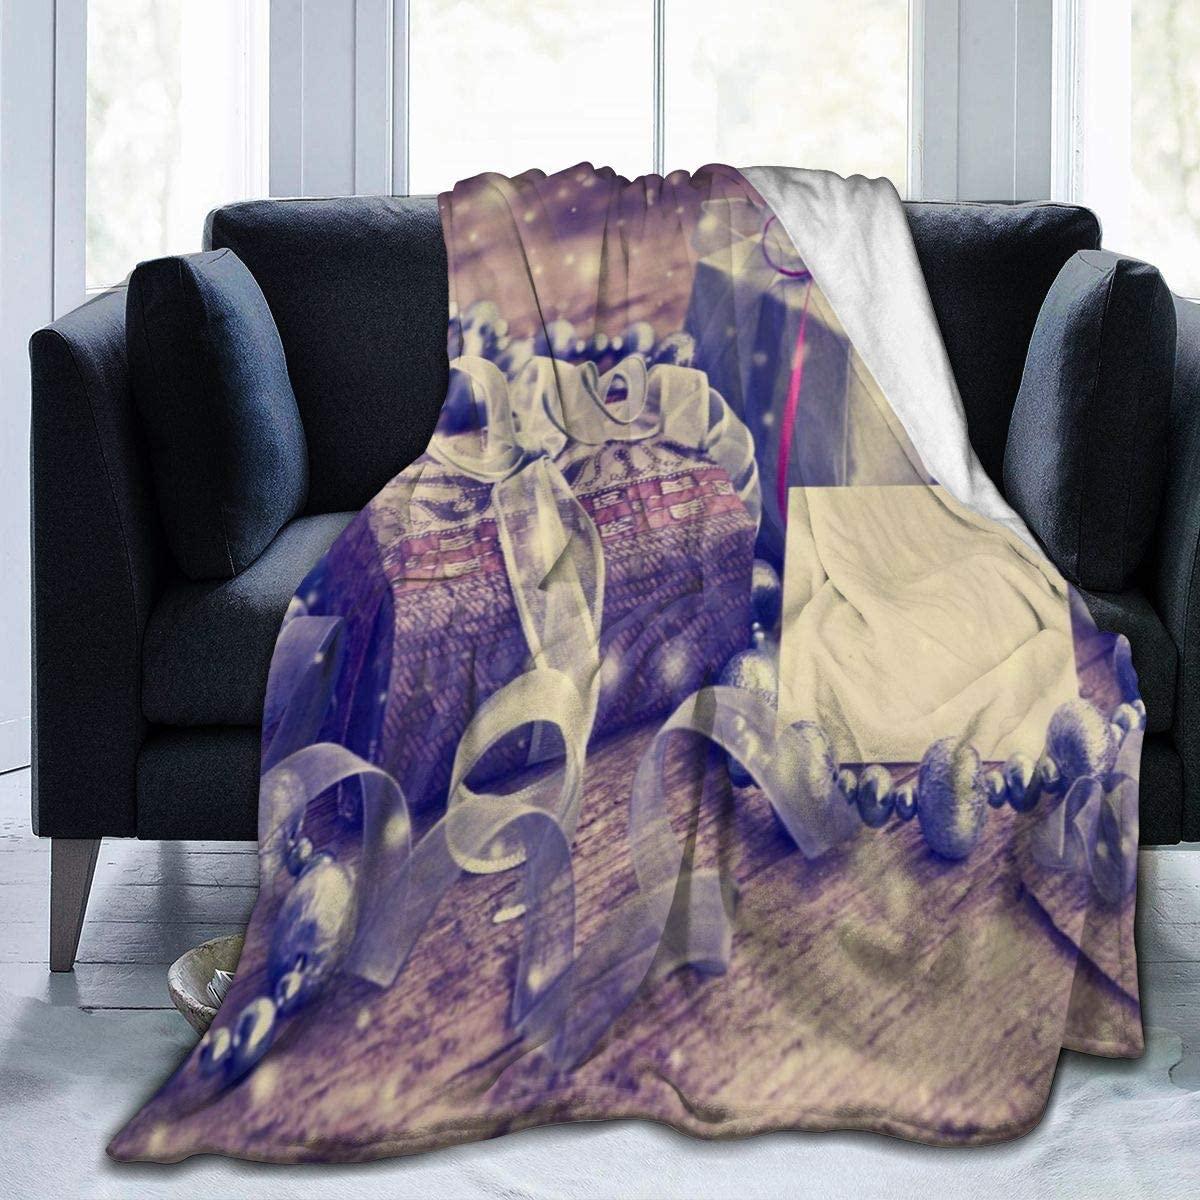 Micro Fleece Plush Soft Baby Blanket Vintage Gift Box Package Christmas Fluffy Warm Toddler Bed/Crib Blanket Lightweight Flannel Daycare Nap Kids Sleeping Tummy Time Throw Blanket Girls Boy Kid/Baby